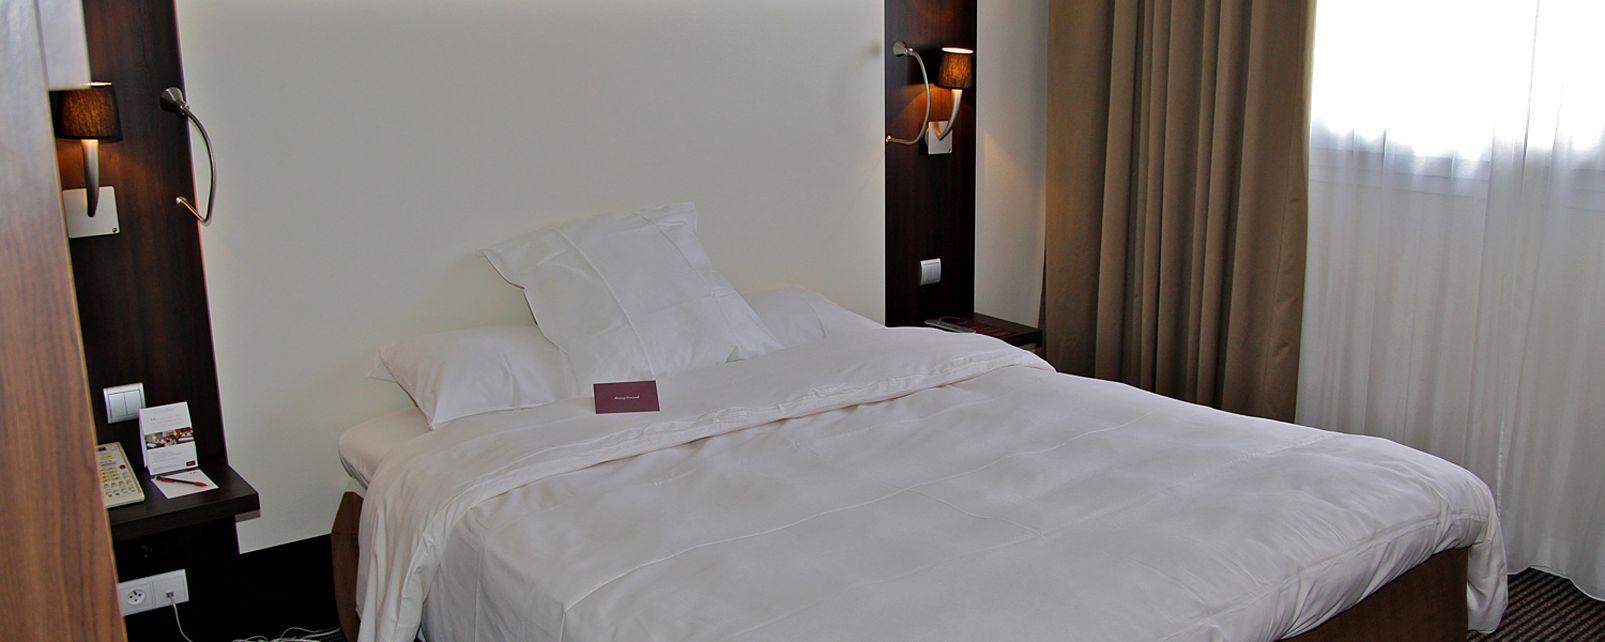 Hotel mercure porte d 39 orleans in paris france for Hotel porte orleans